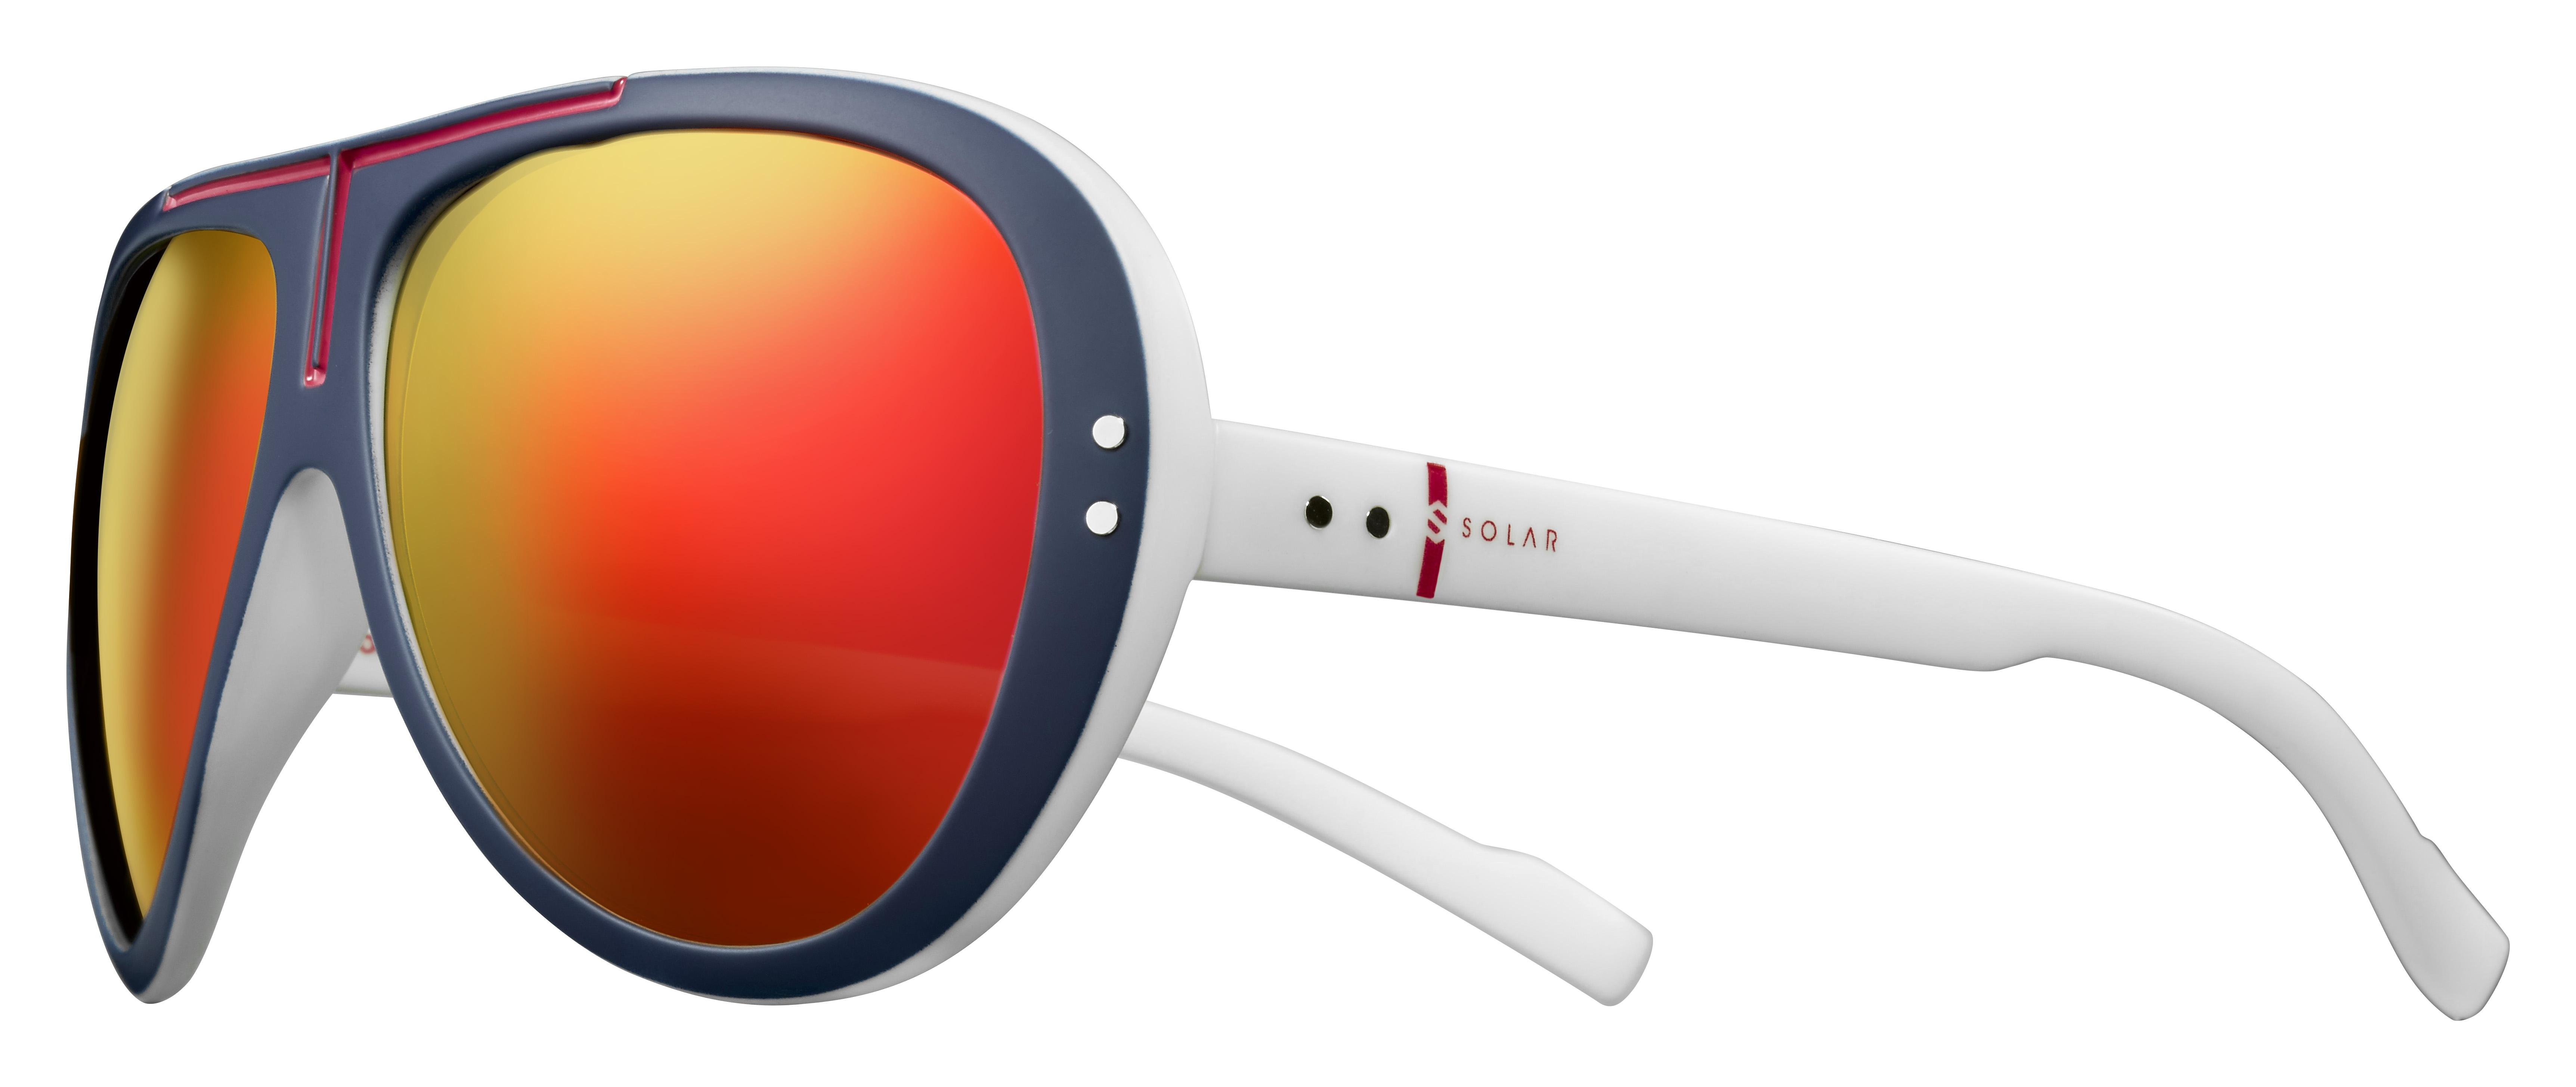 Himal Sport dystrybutorem okularów marki Solar